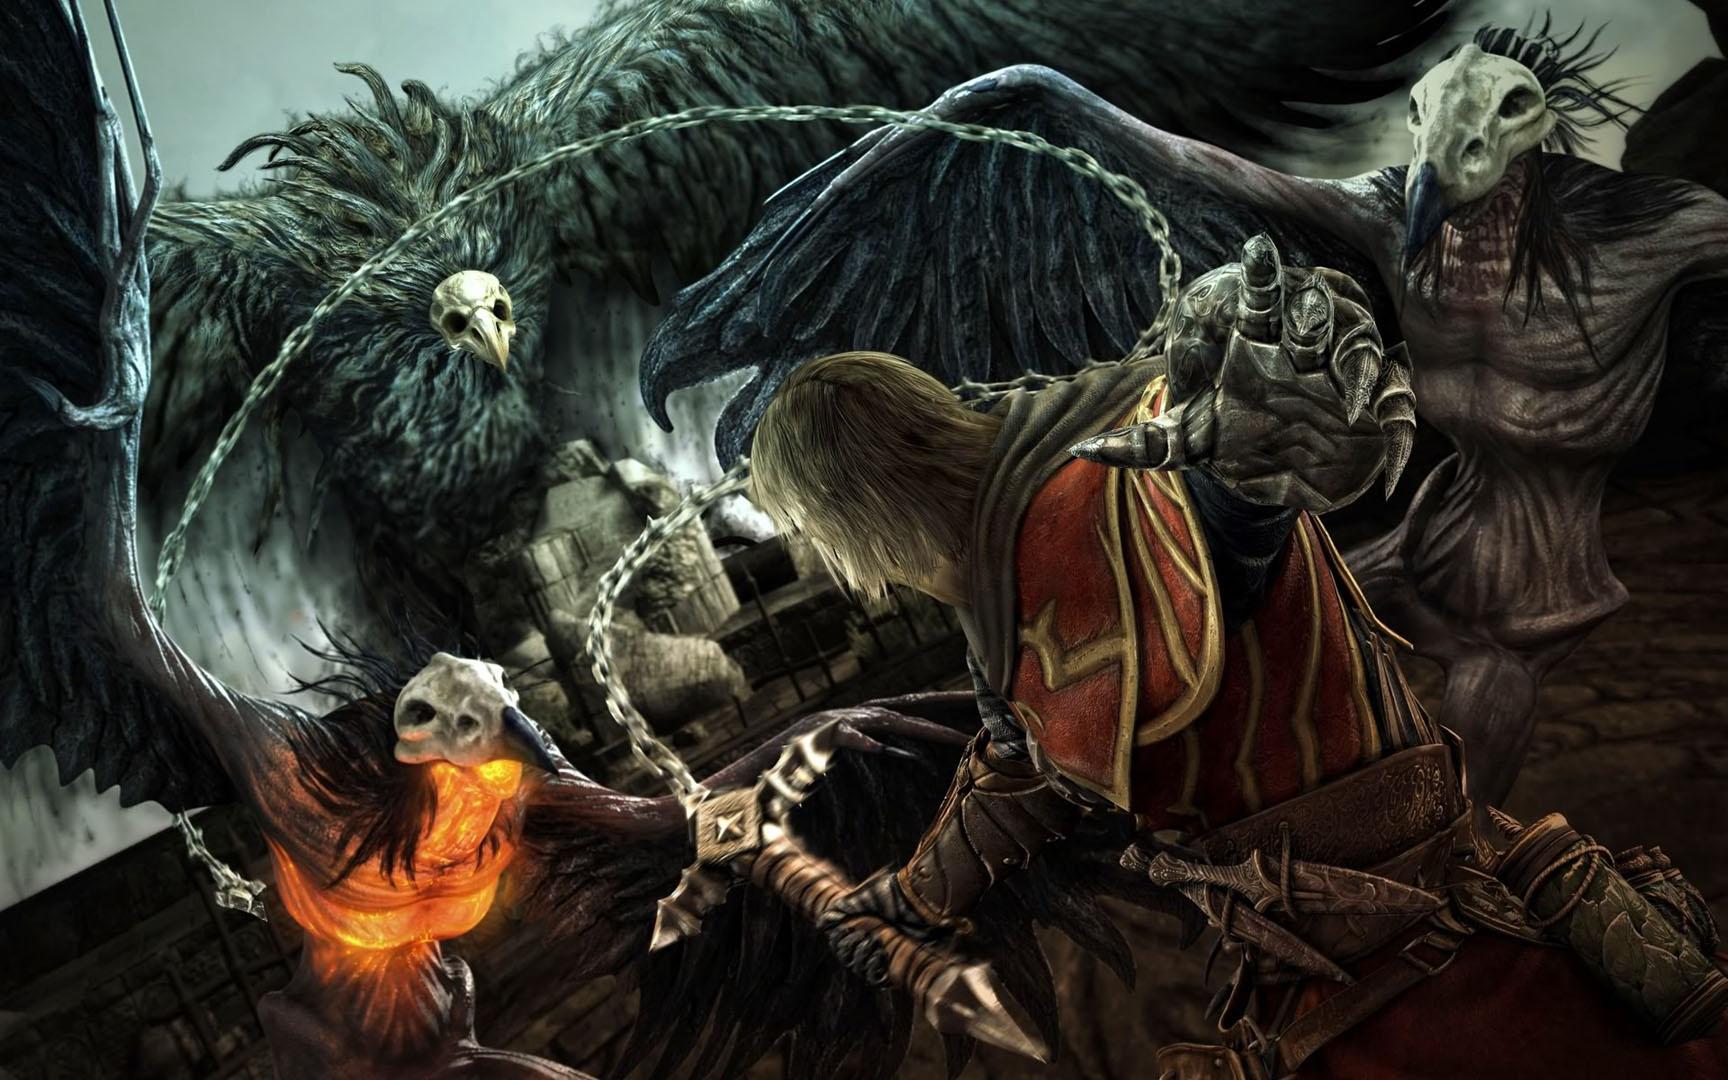 Belmont Fighting Three Harpies